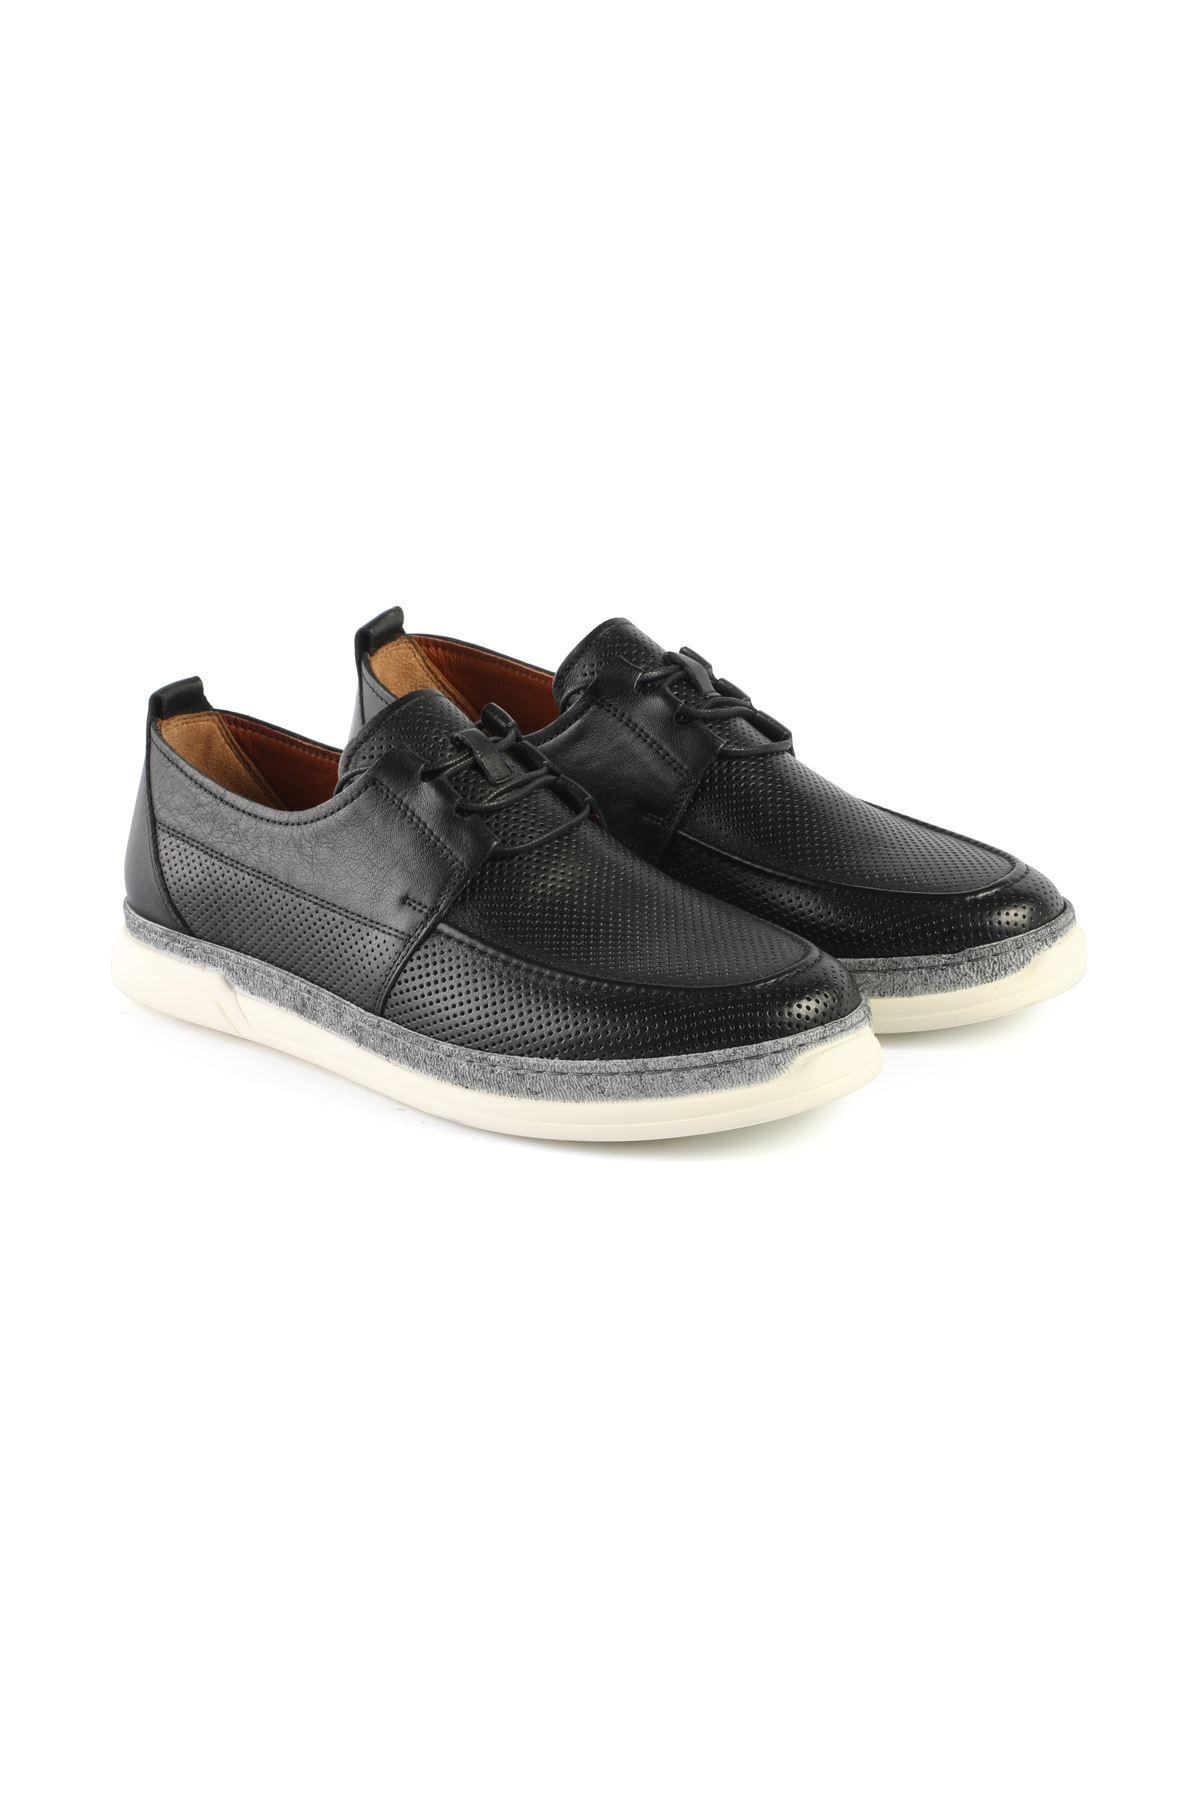 Libero L3418 Black Loafer Shoes